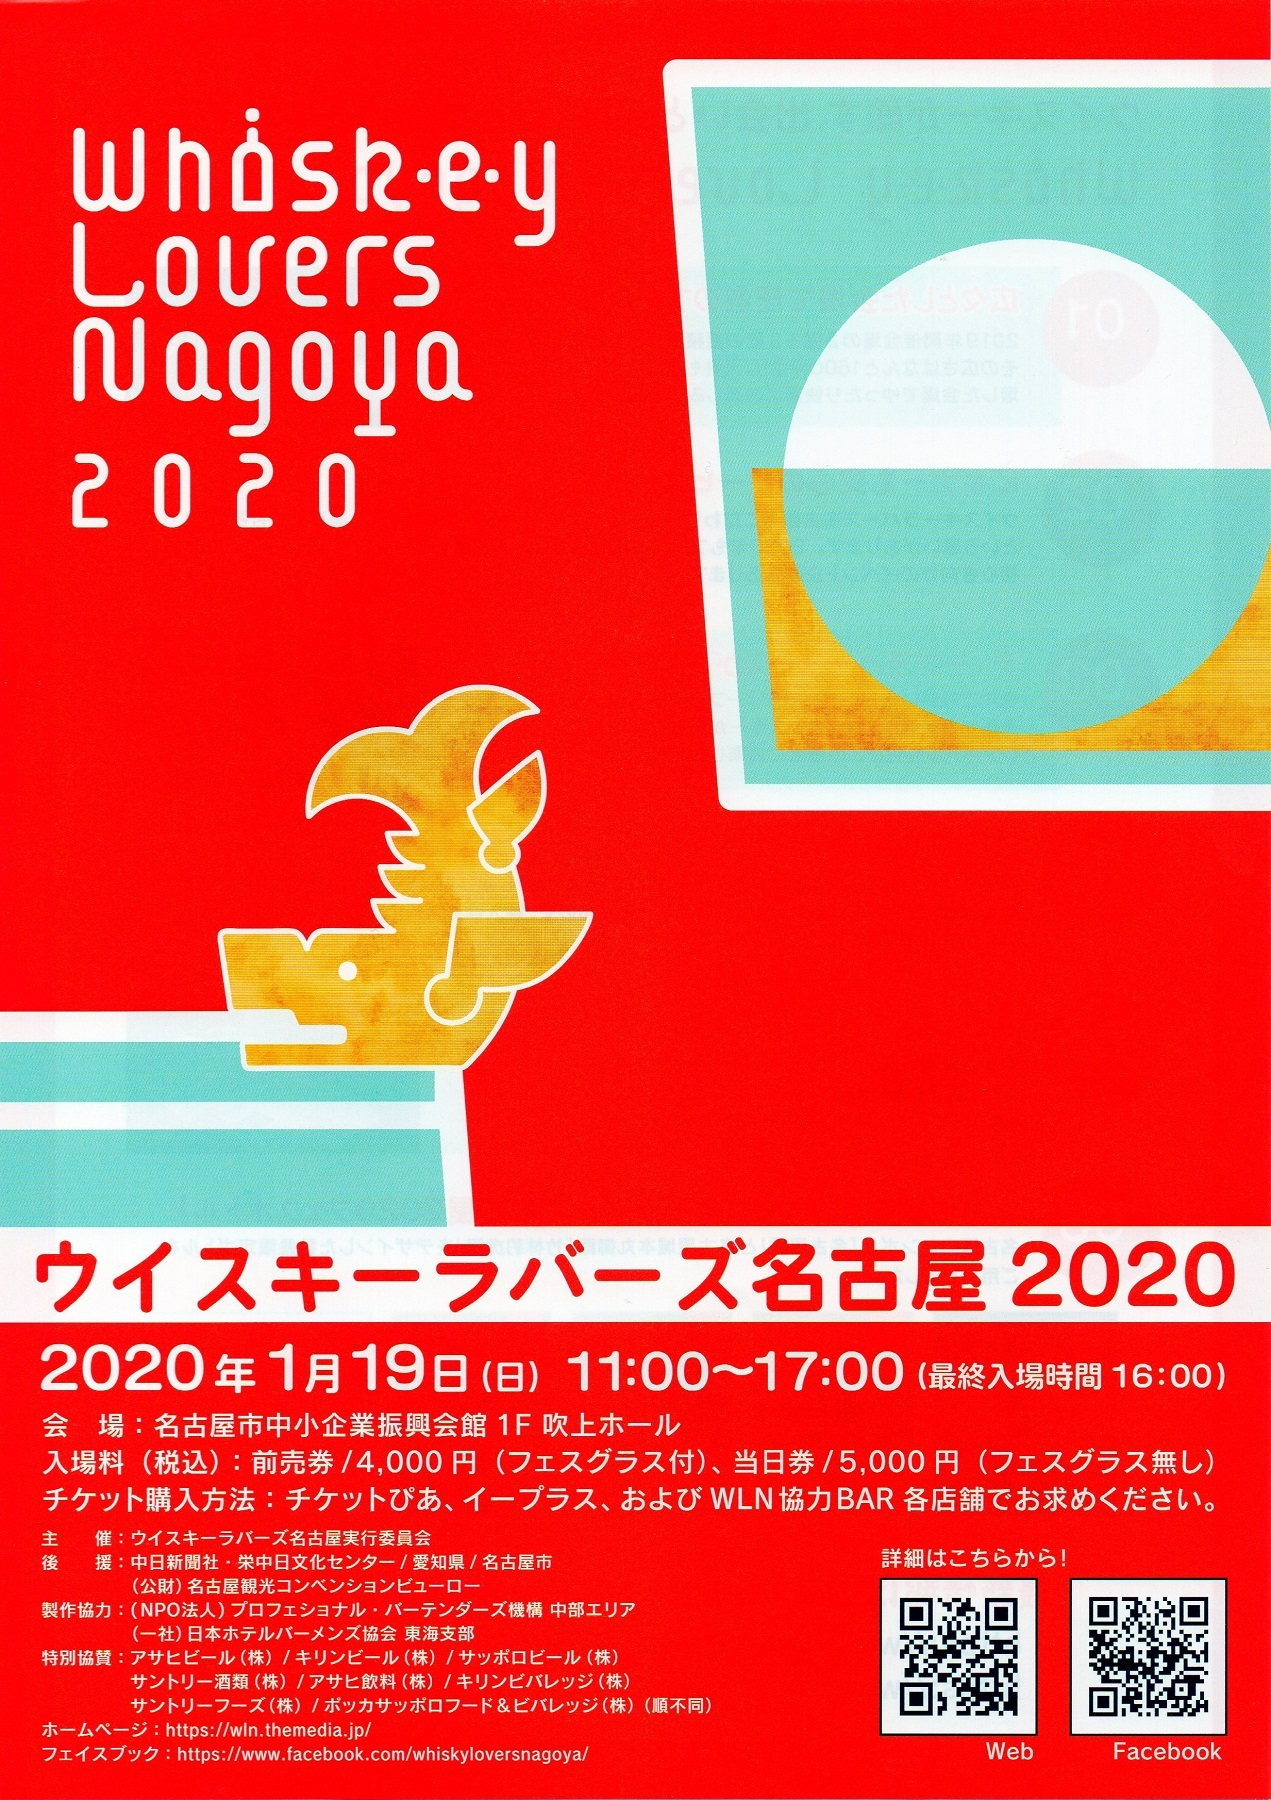 Whiskey overs Nagoya 2020_1800